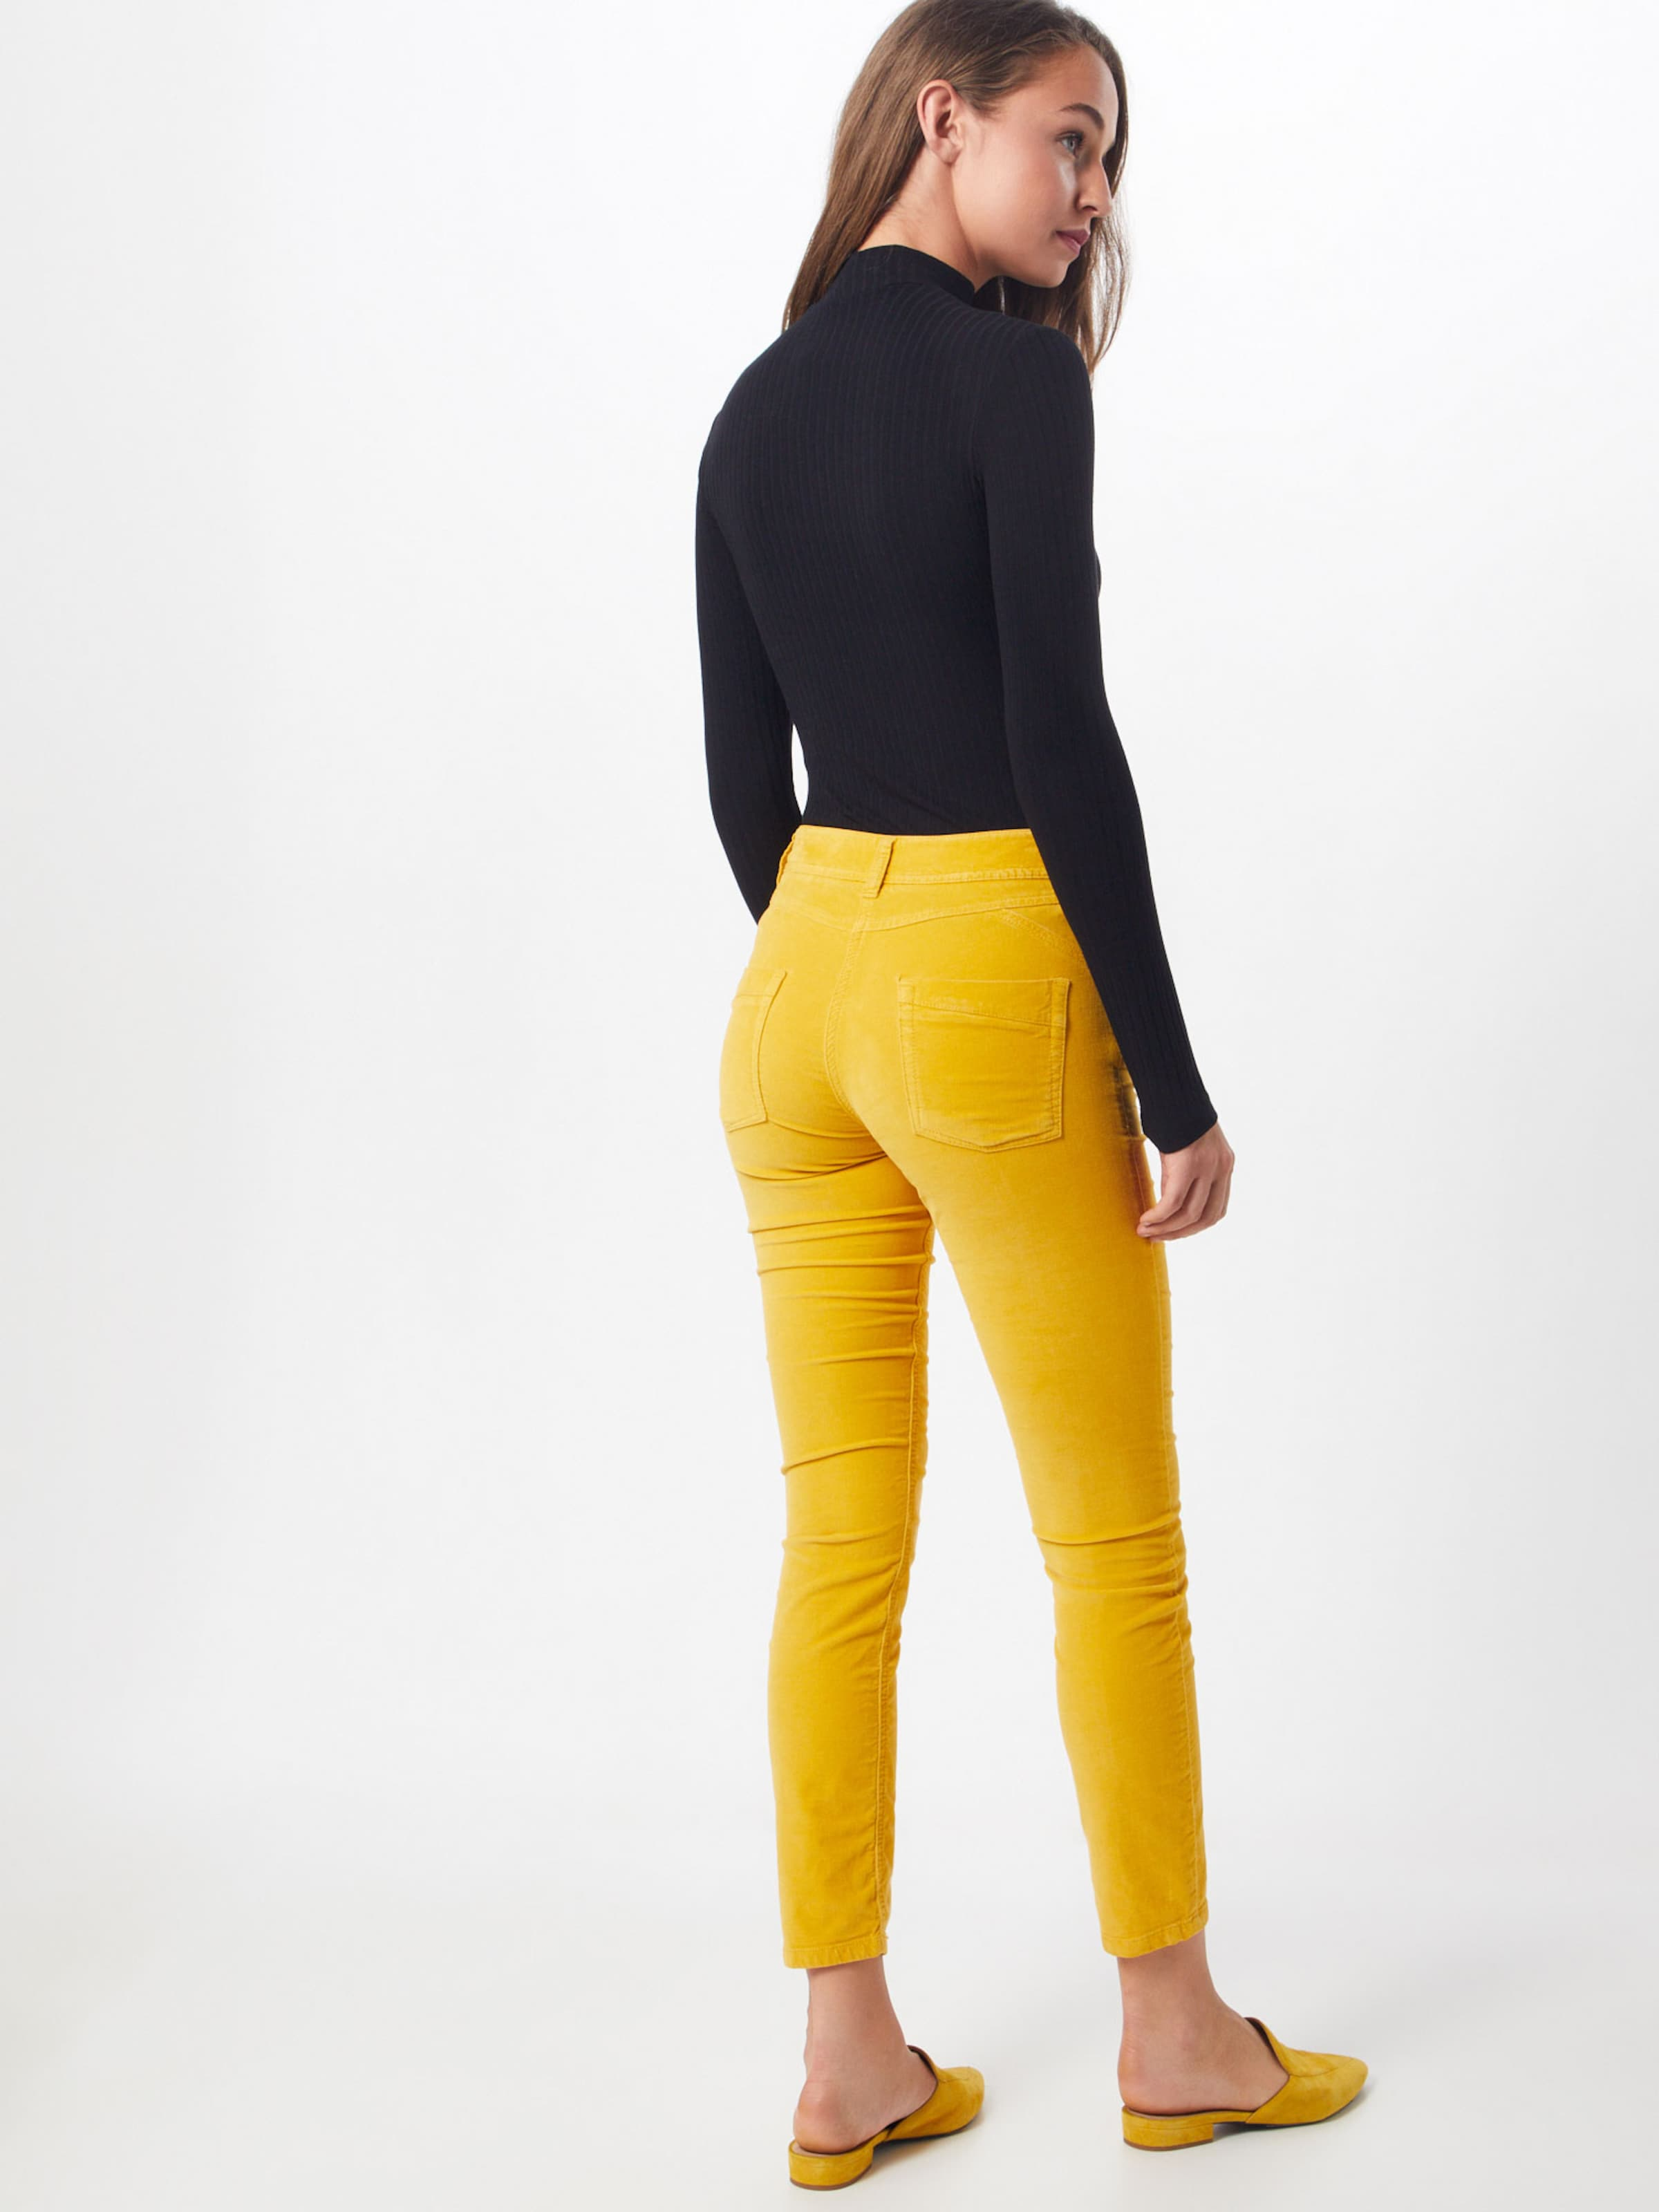 En En Pantalon Laurel '82025' Laurel '82025' Jaune Pantalon Laurel Jaune Pantalon '82025' KTlJ1ucF3